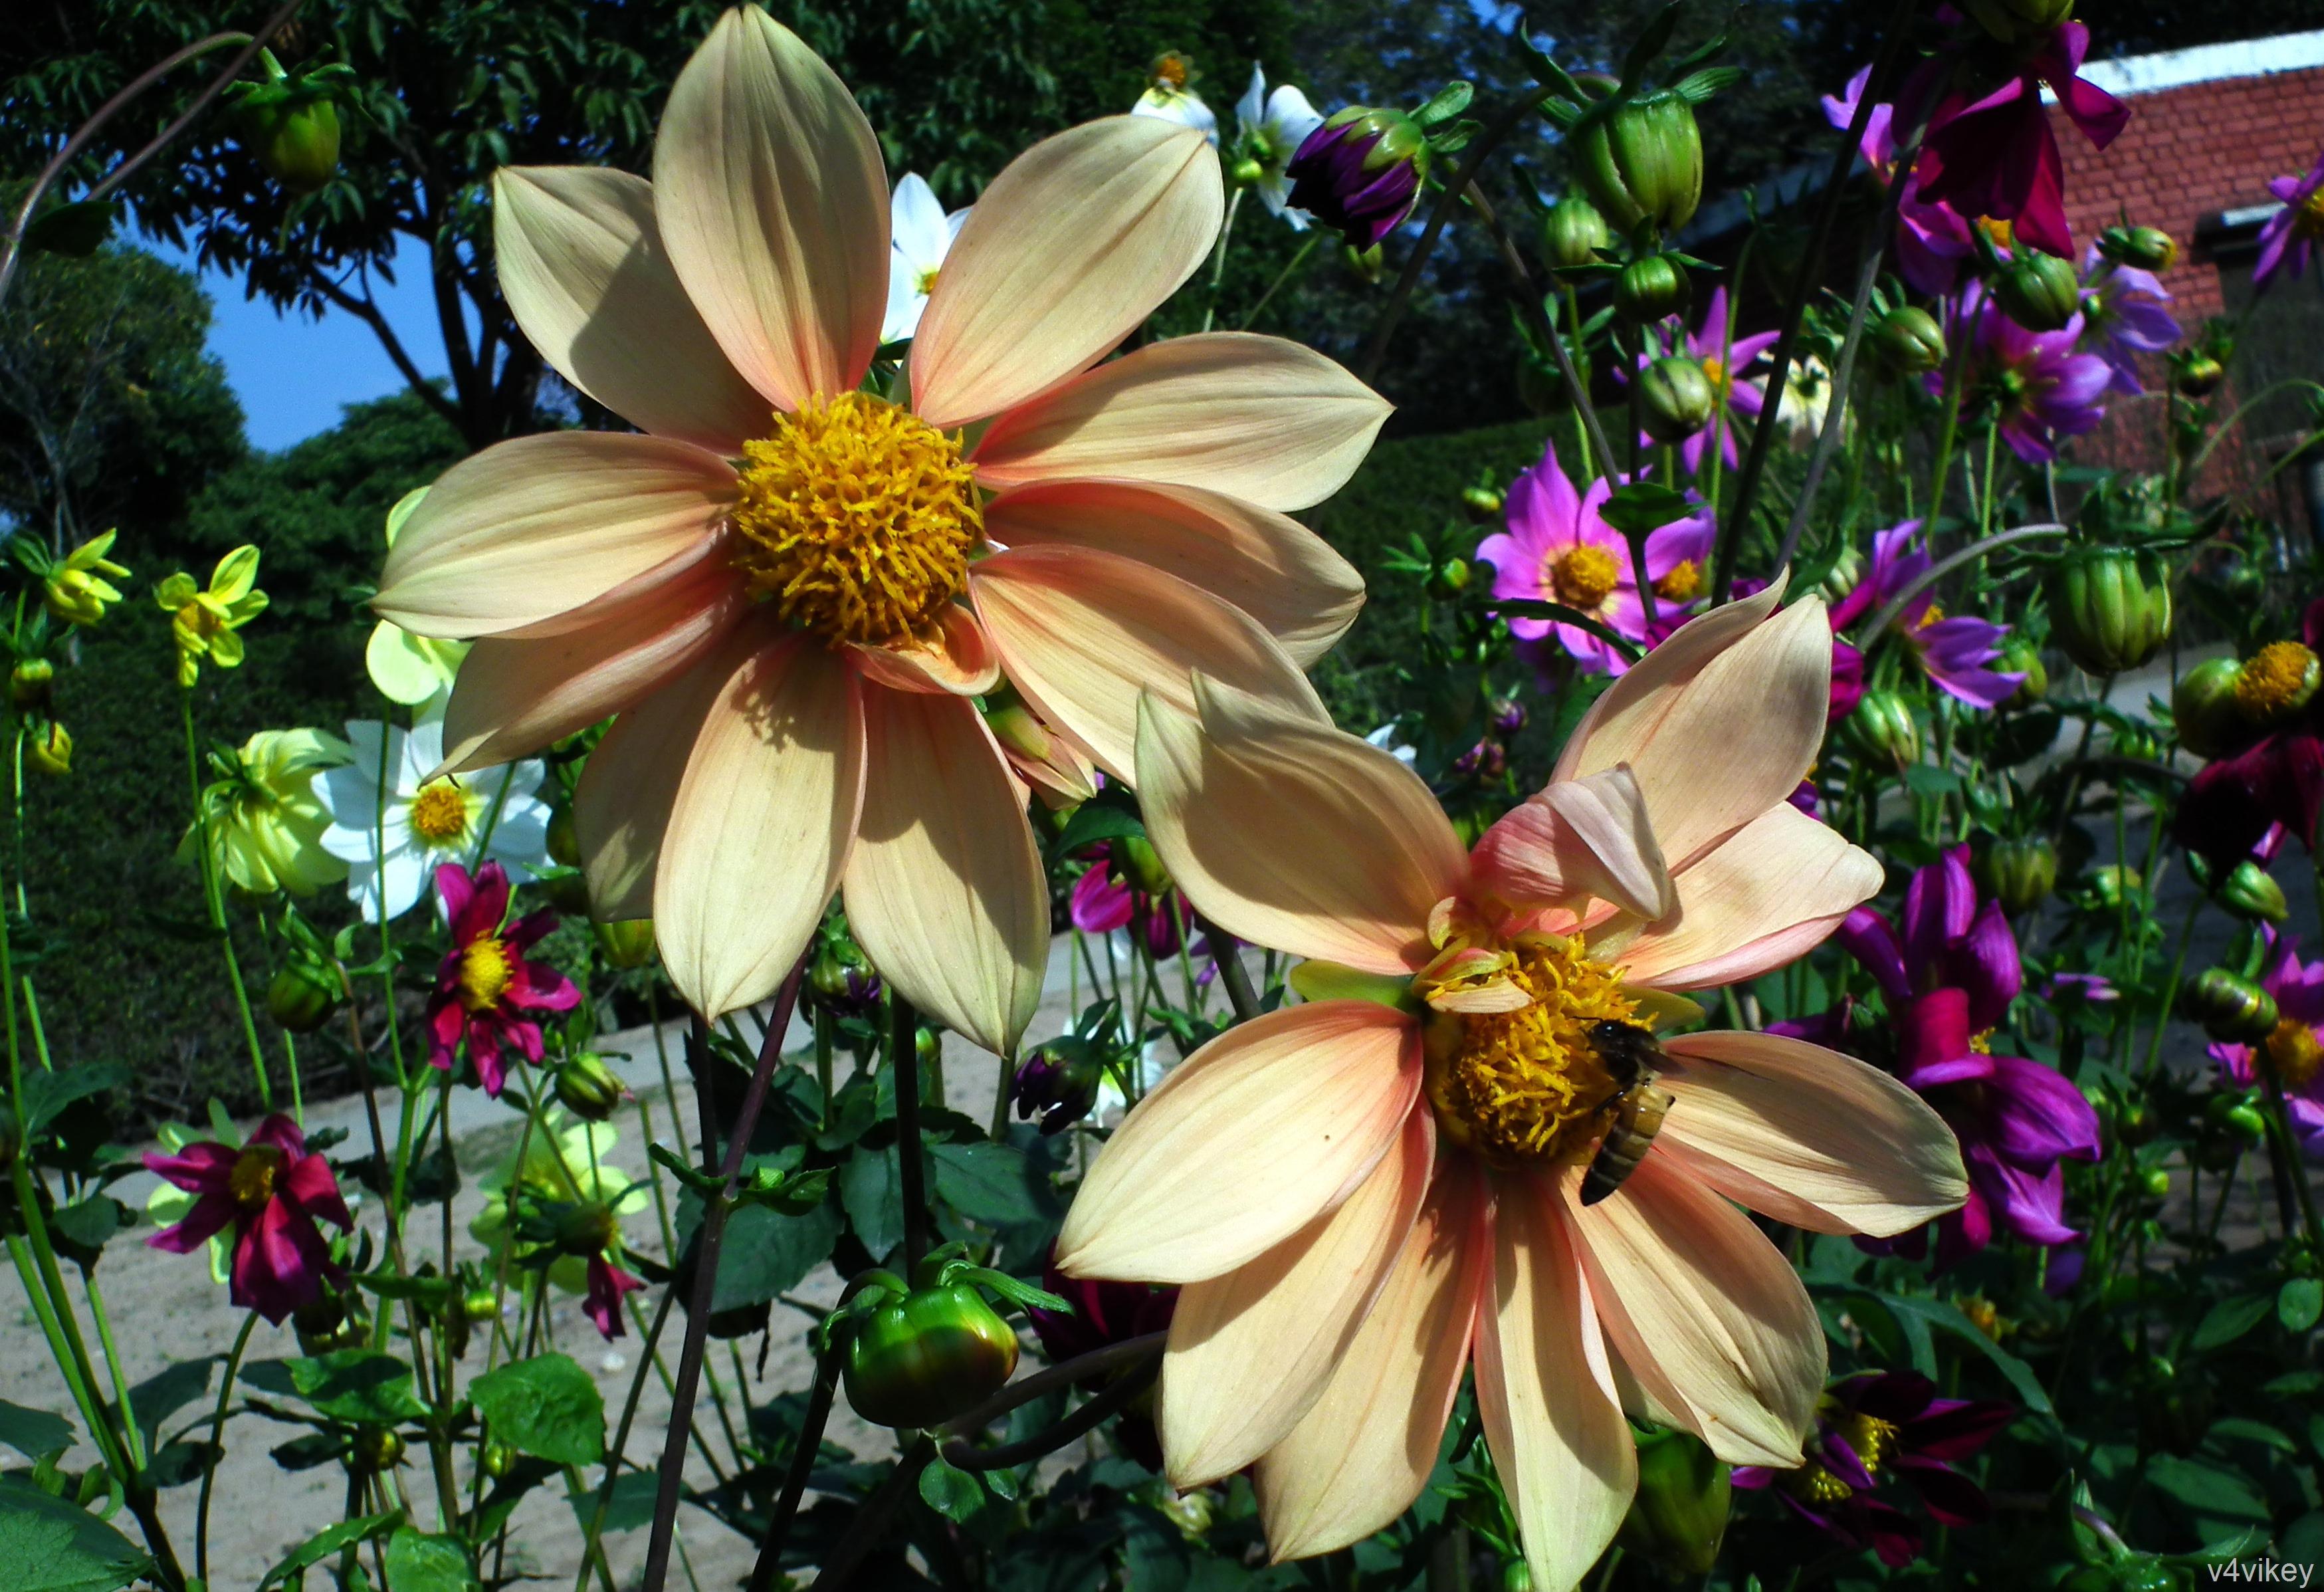 Beautiful Apricot Bronze Color Dahlia Flower Photograph Wallpaper